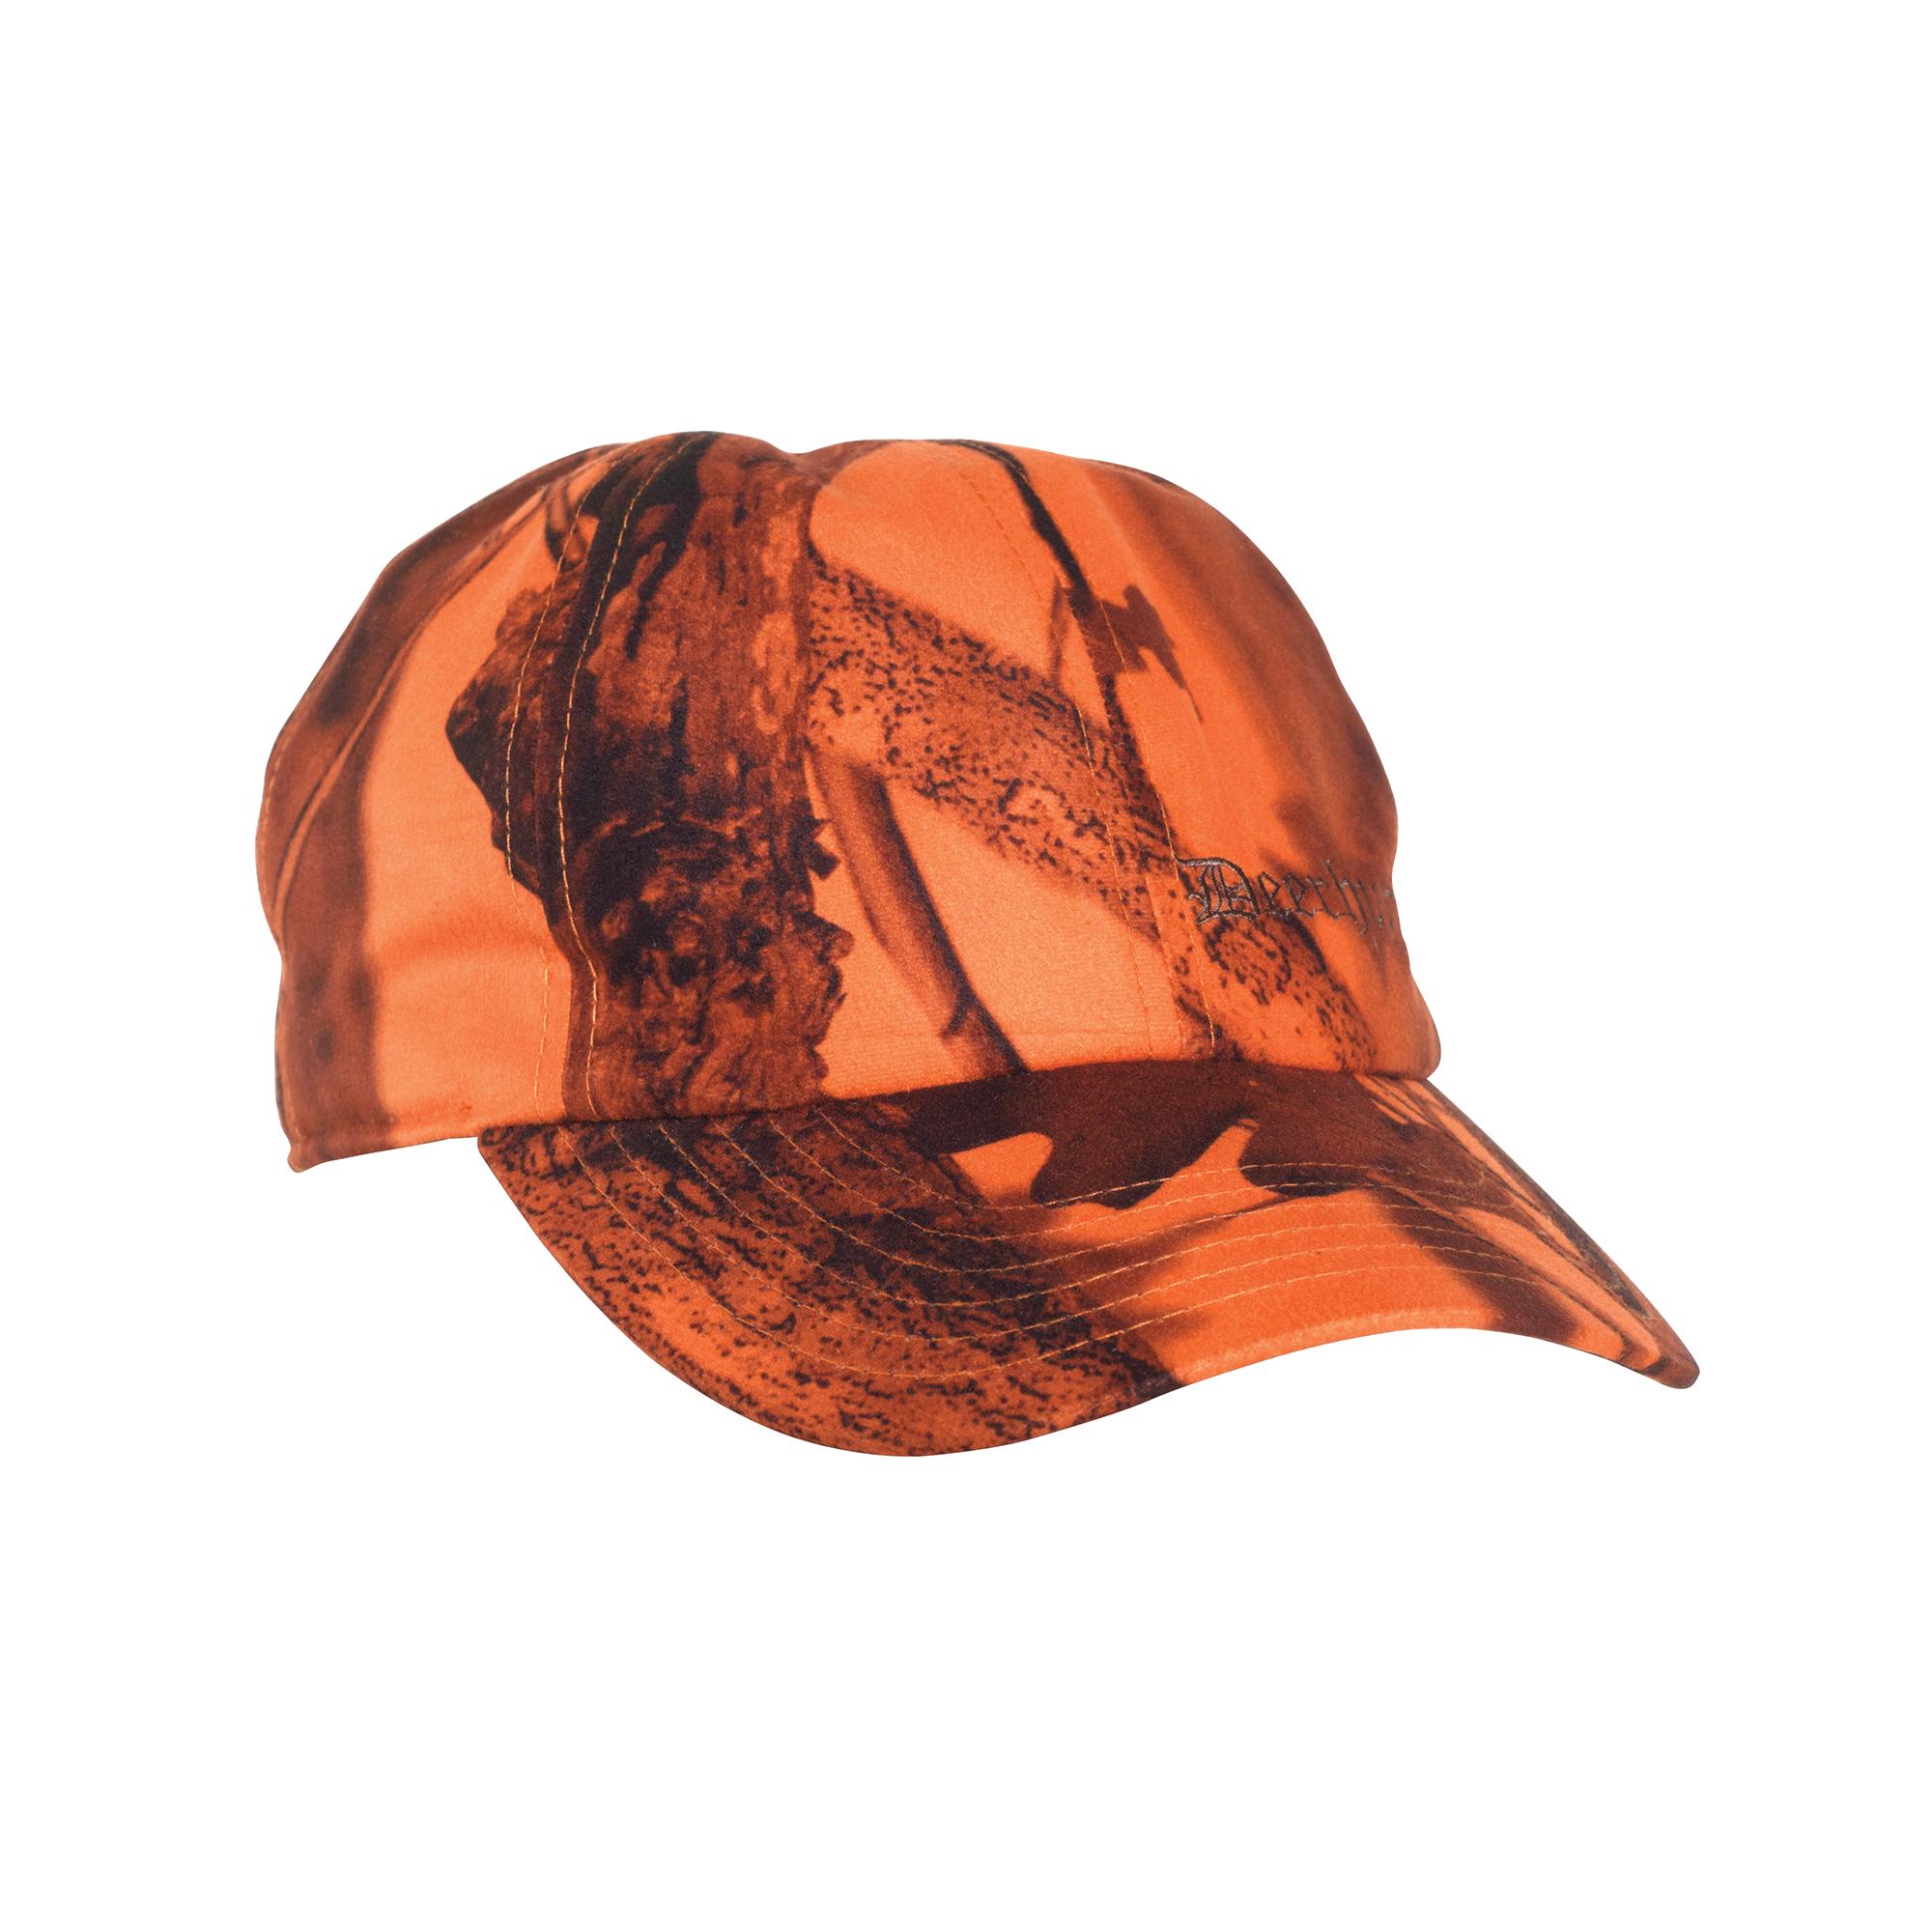 31b8e4631cd Cumberland Cap w. Neck Cover - Deerhunter